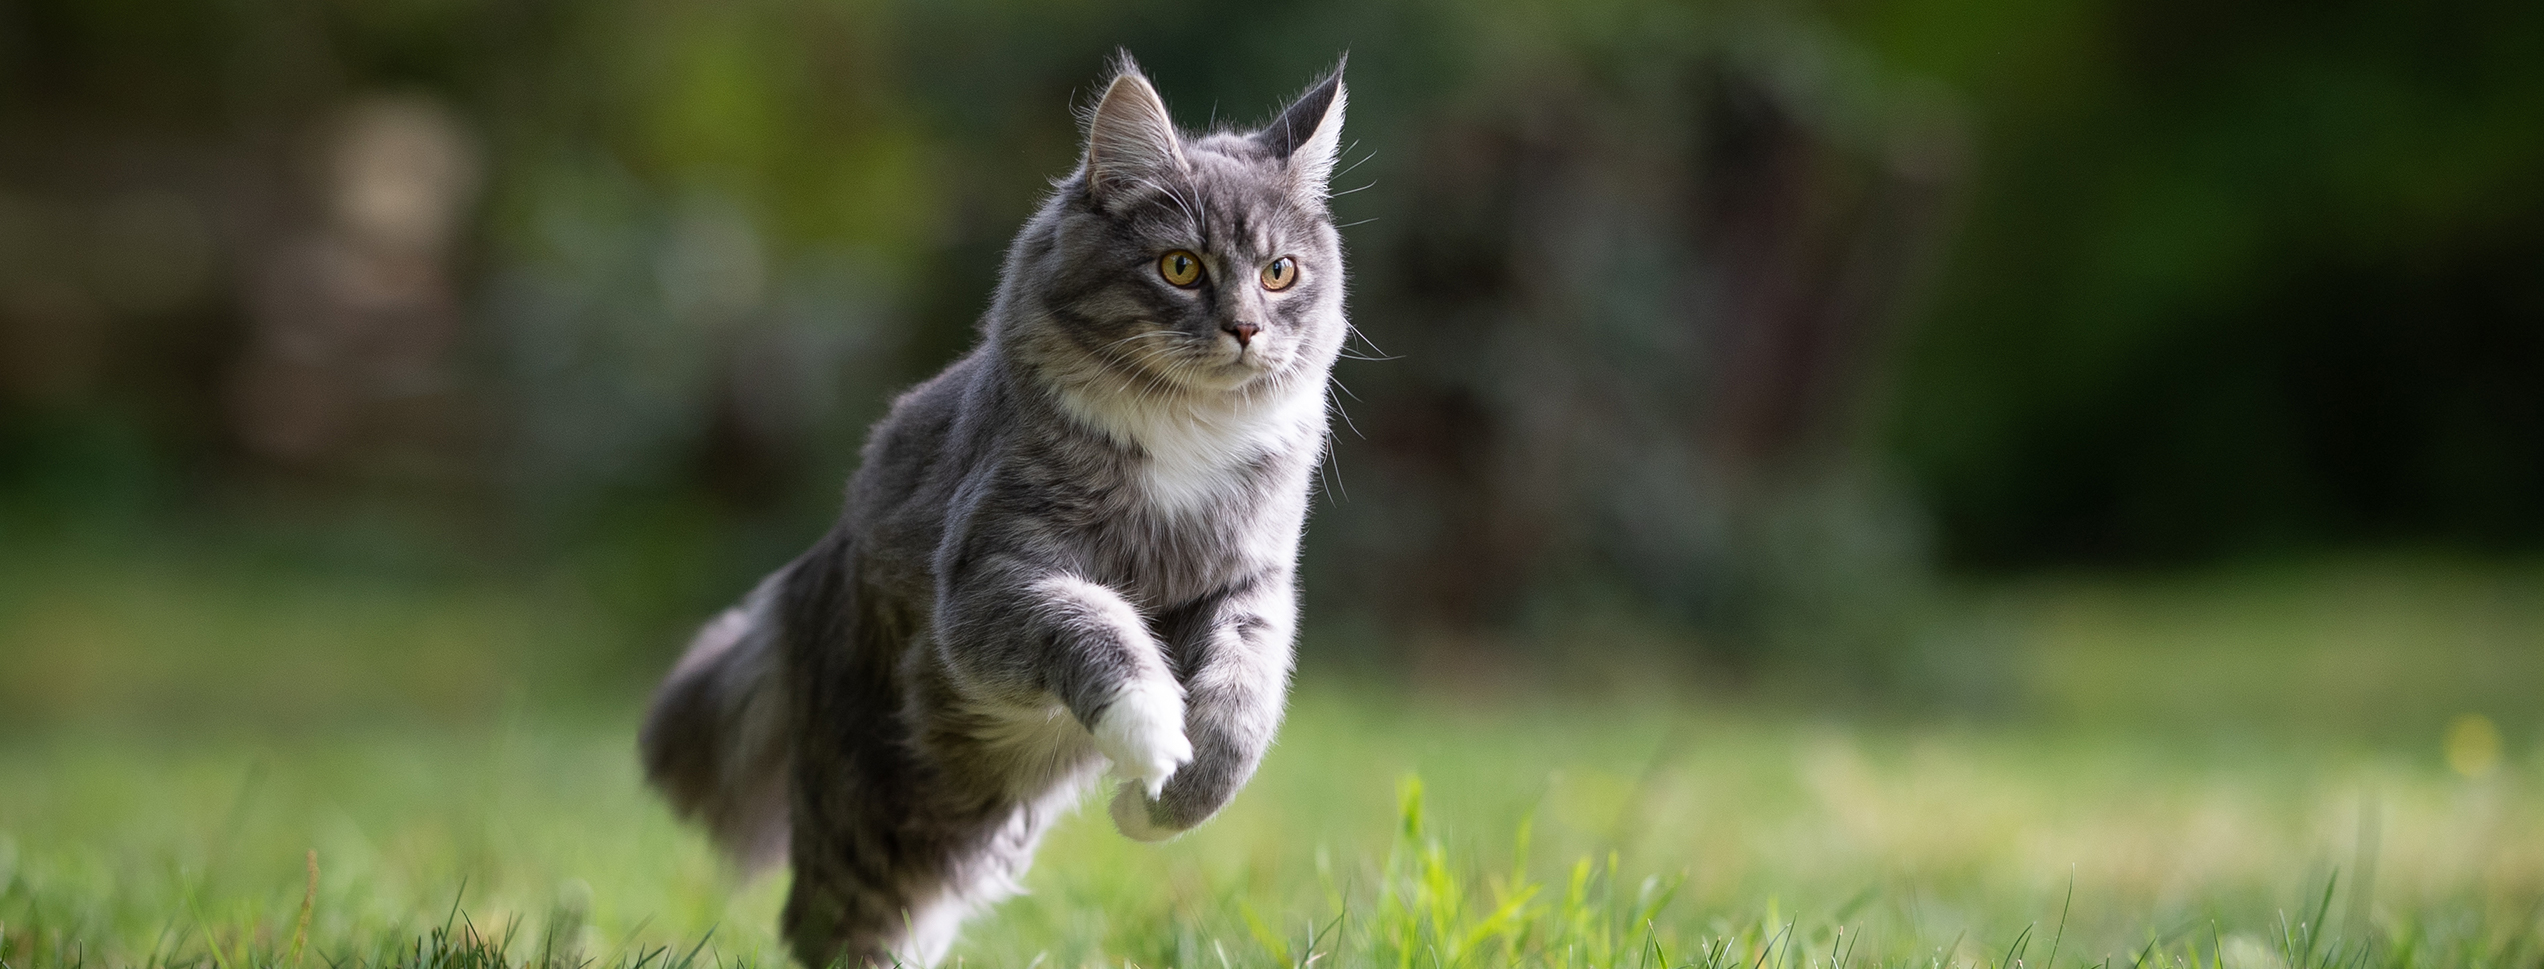 Orange cat walking down dirt path